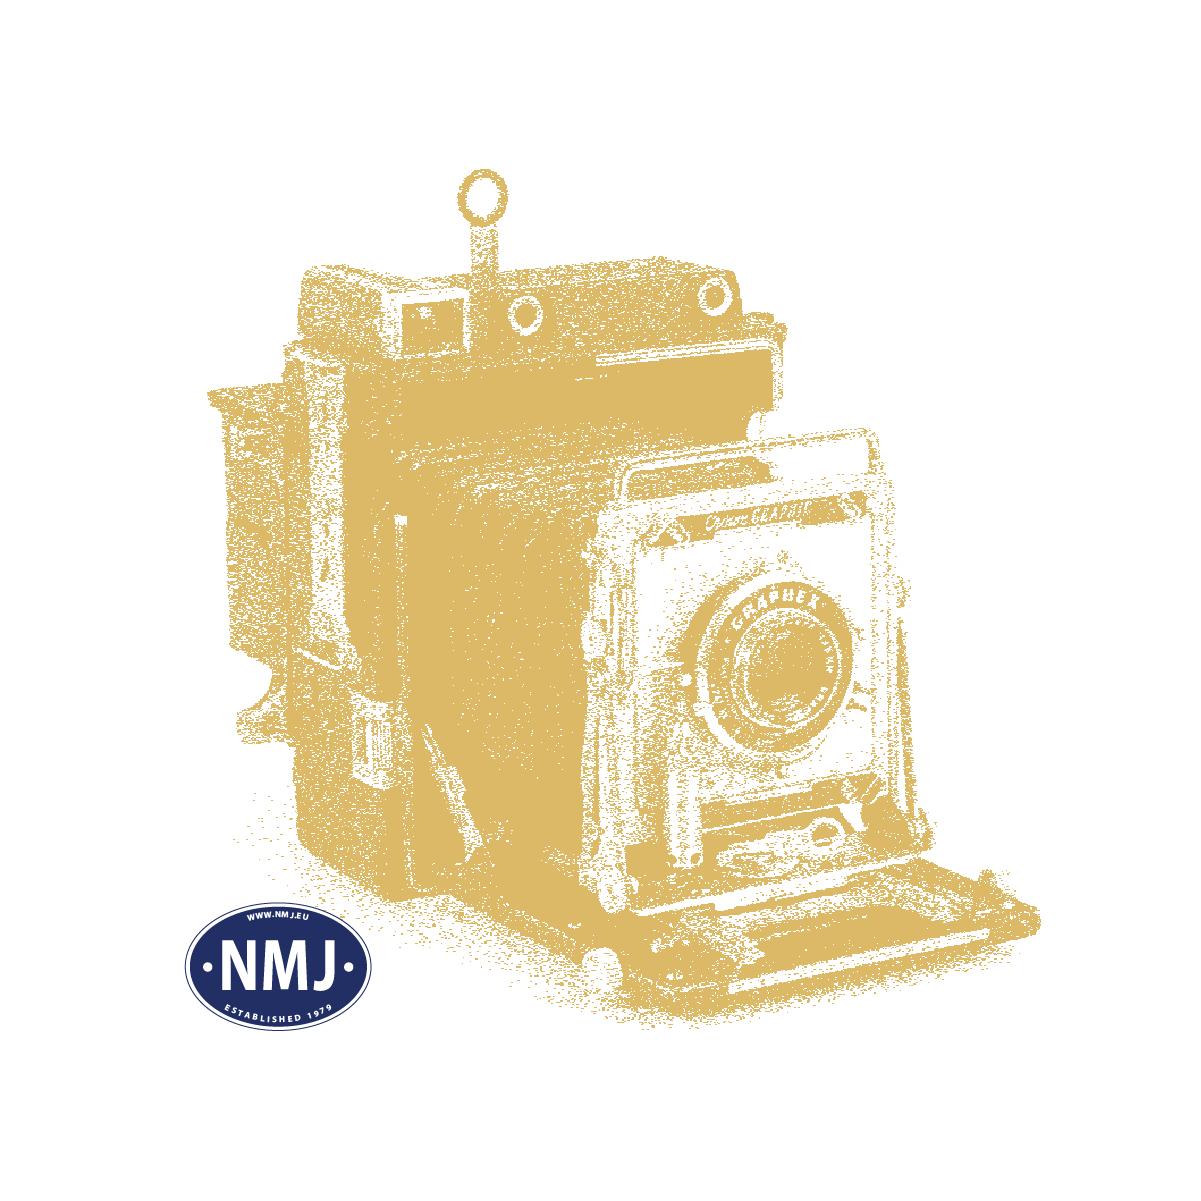 NMJT84.202L - NMJ Topline NSB BM69A.15, DCC m/ Sound und Innenbeleuchtung